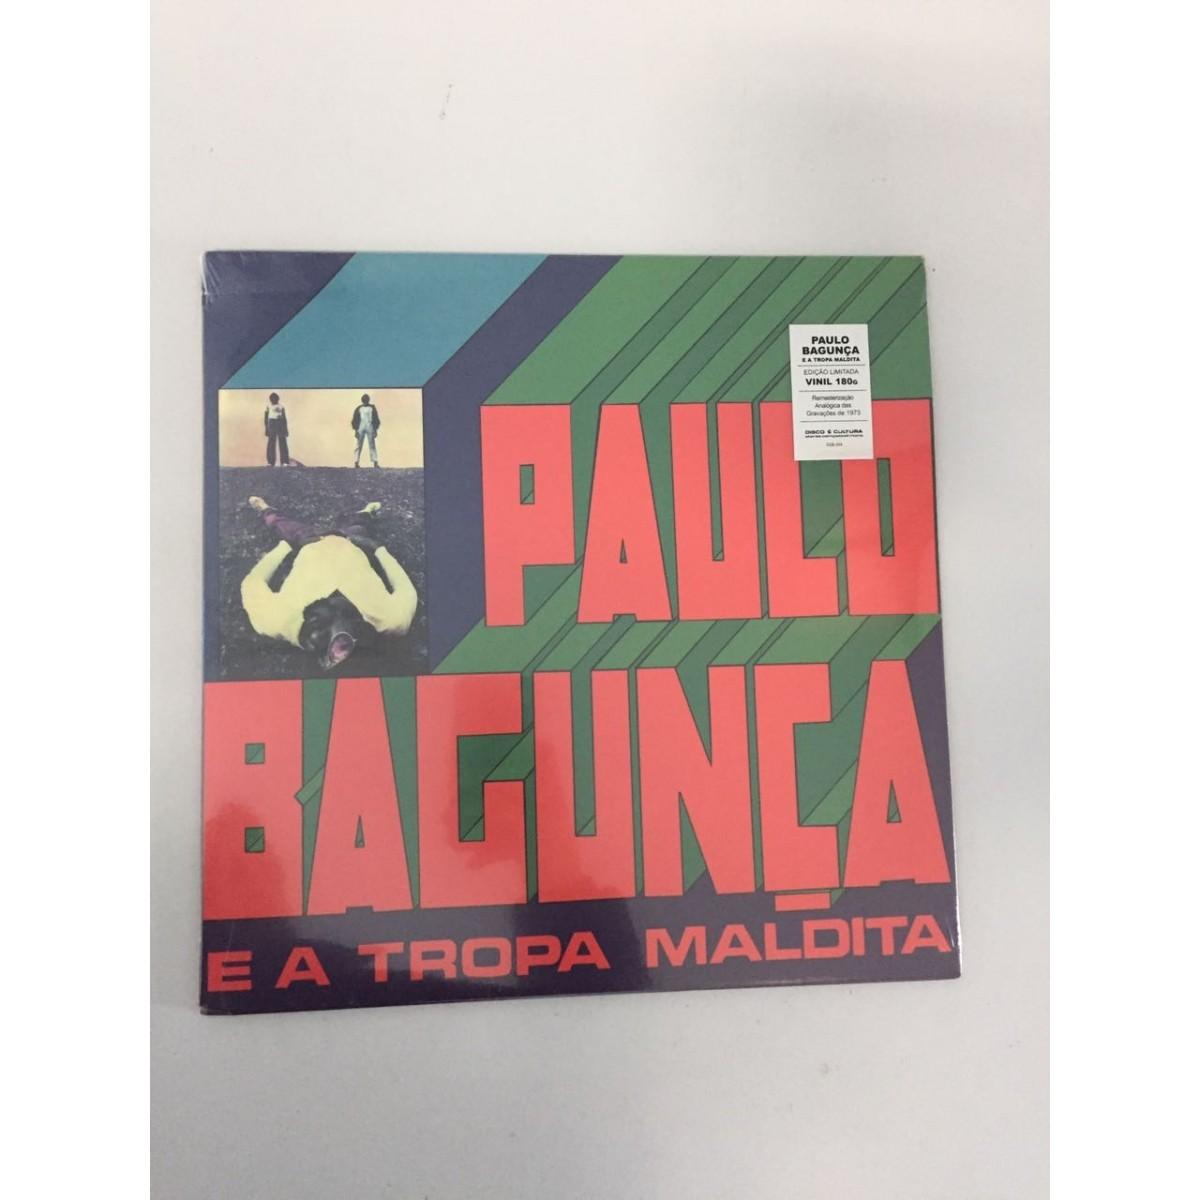 Lp Paulo Bagunça E A Tropa Maldita CAPA AMASSADA